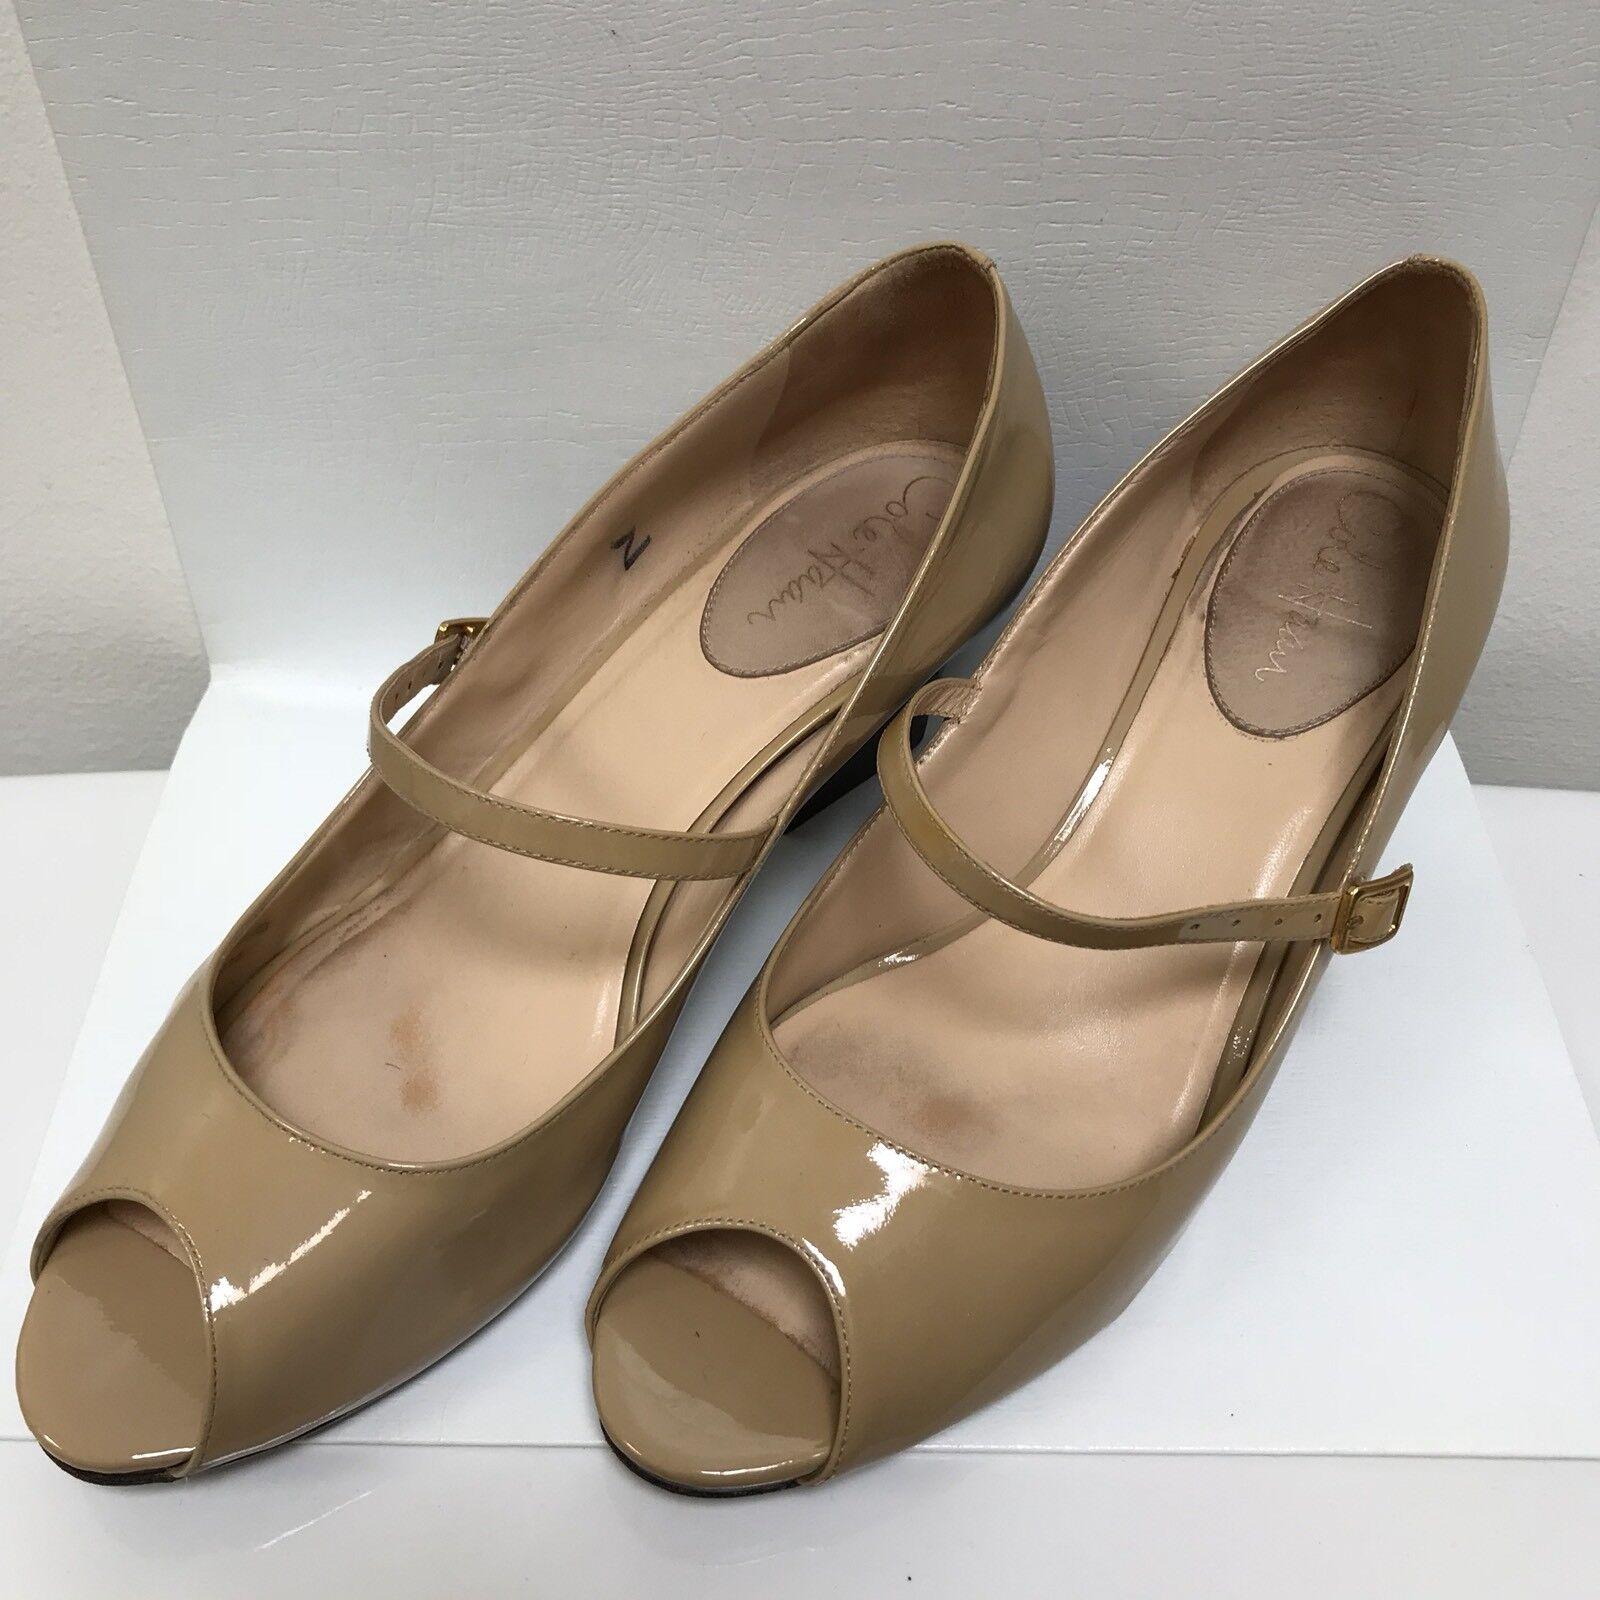 Cole Haan Tan Patent Leder Mary Jane Heels Open Toe 9 1/2